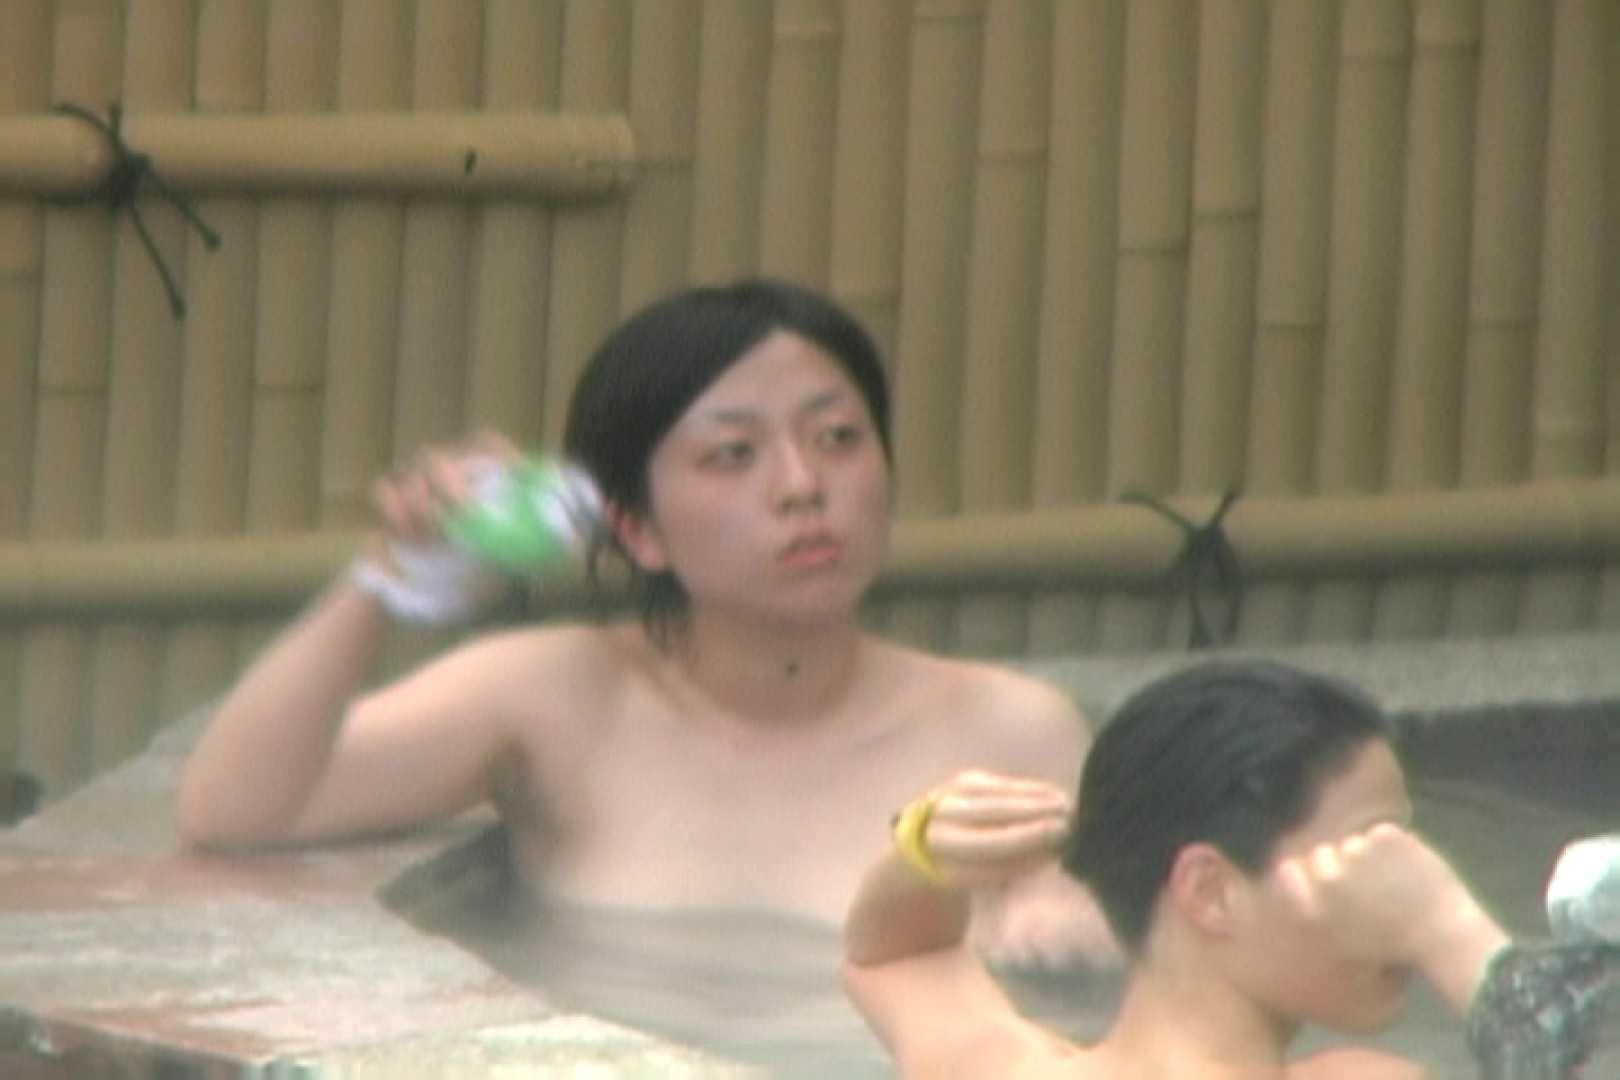 Aquaな露天風呂Vol.562 露天 AV無料動画キャプチャ 109画像 11